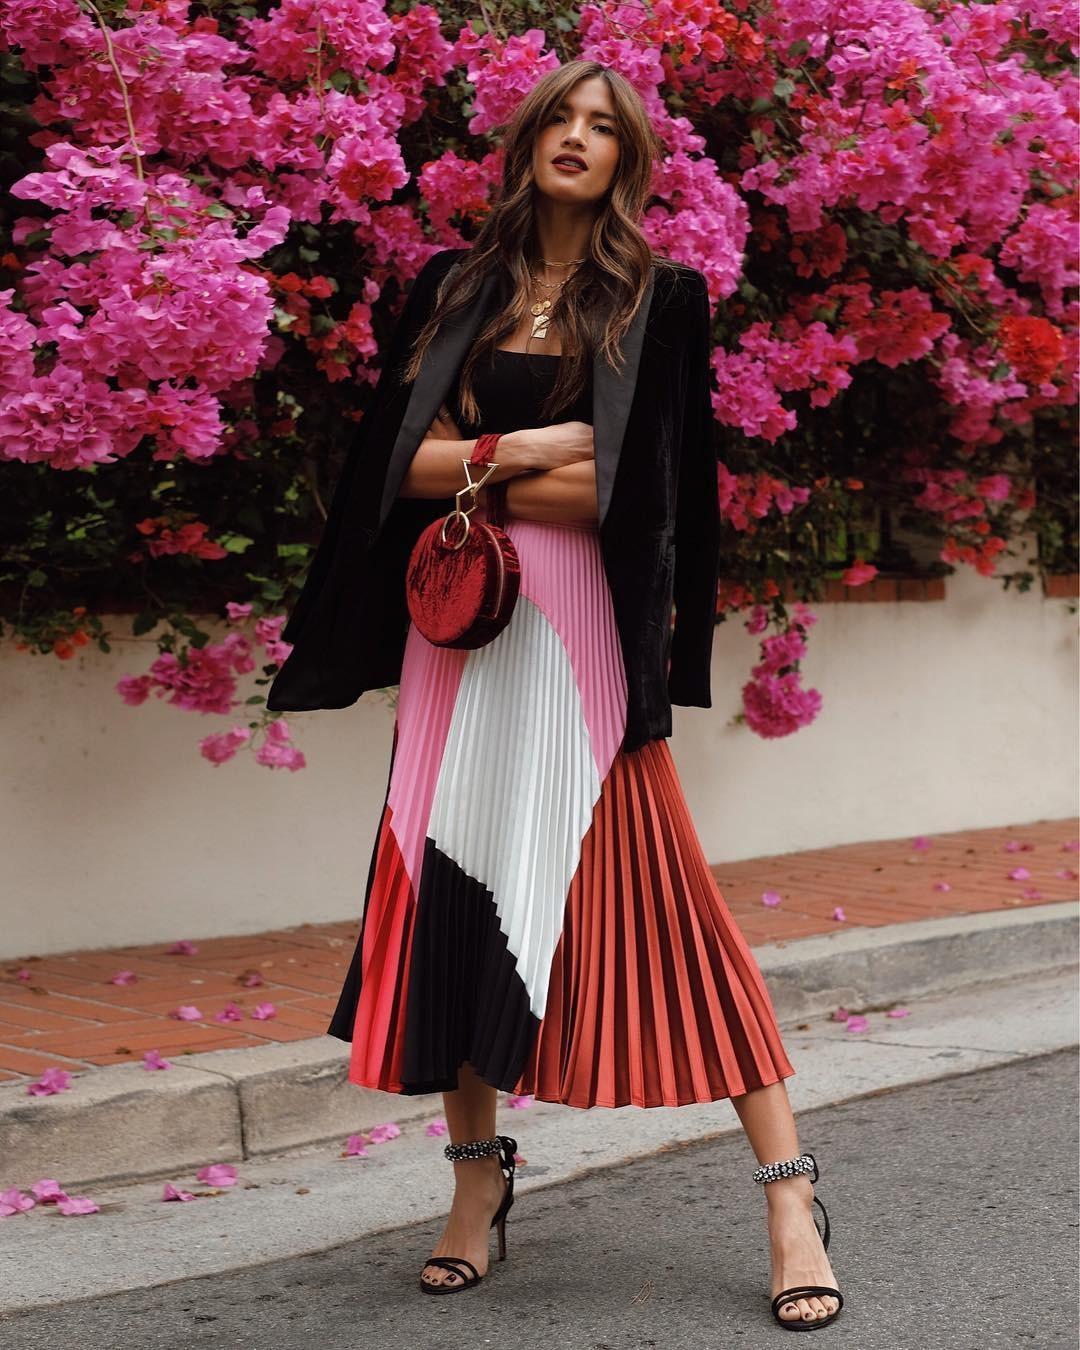 15 faldas plisadas perfectas para llevar de la ofi a cenar sin pasar por  casa bb2a54bc638c